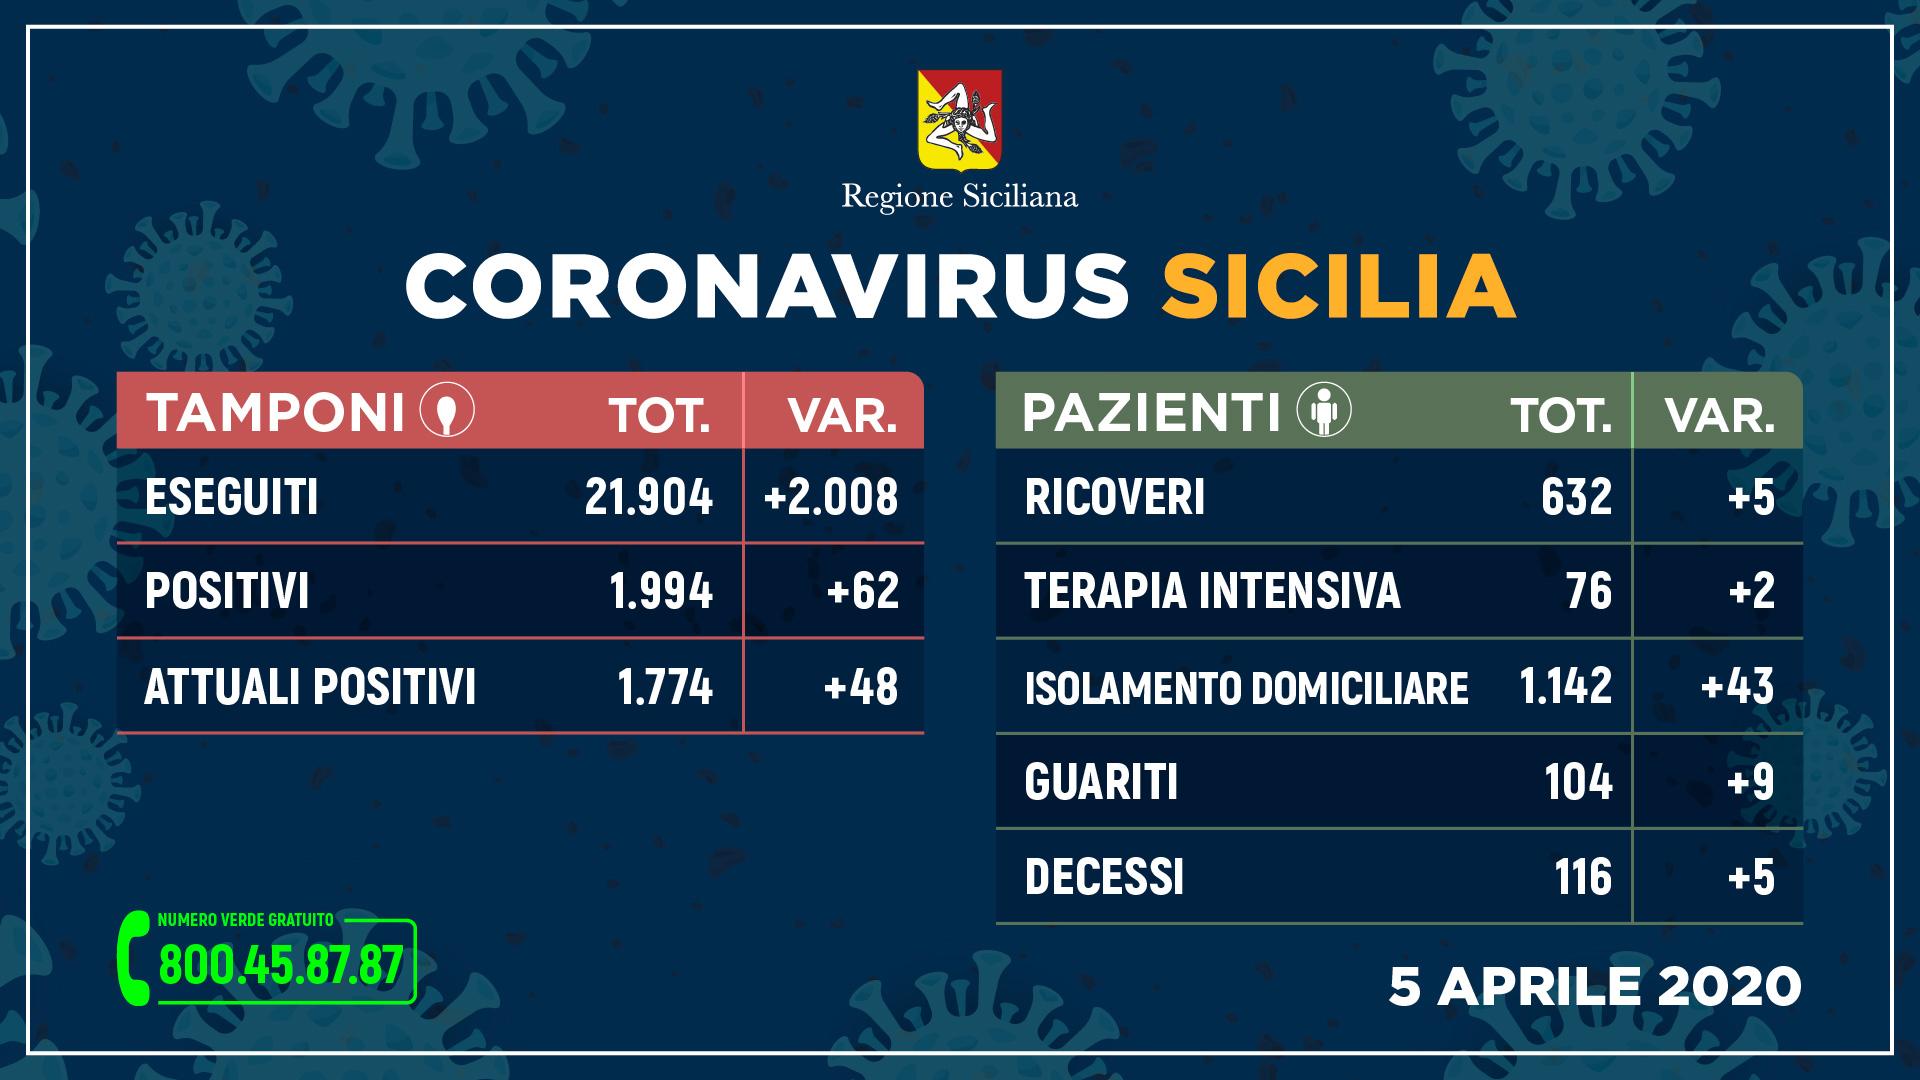 Coronavirus Sicilia 5 aprile, i positivi superano la quota duemila, i deceduti sfiorano i 120